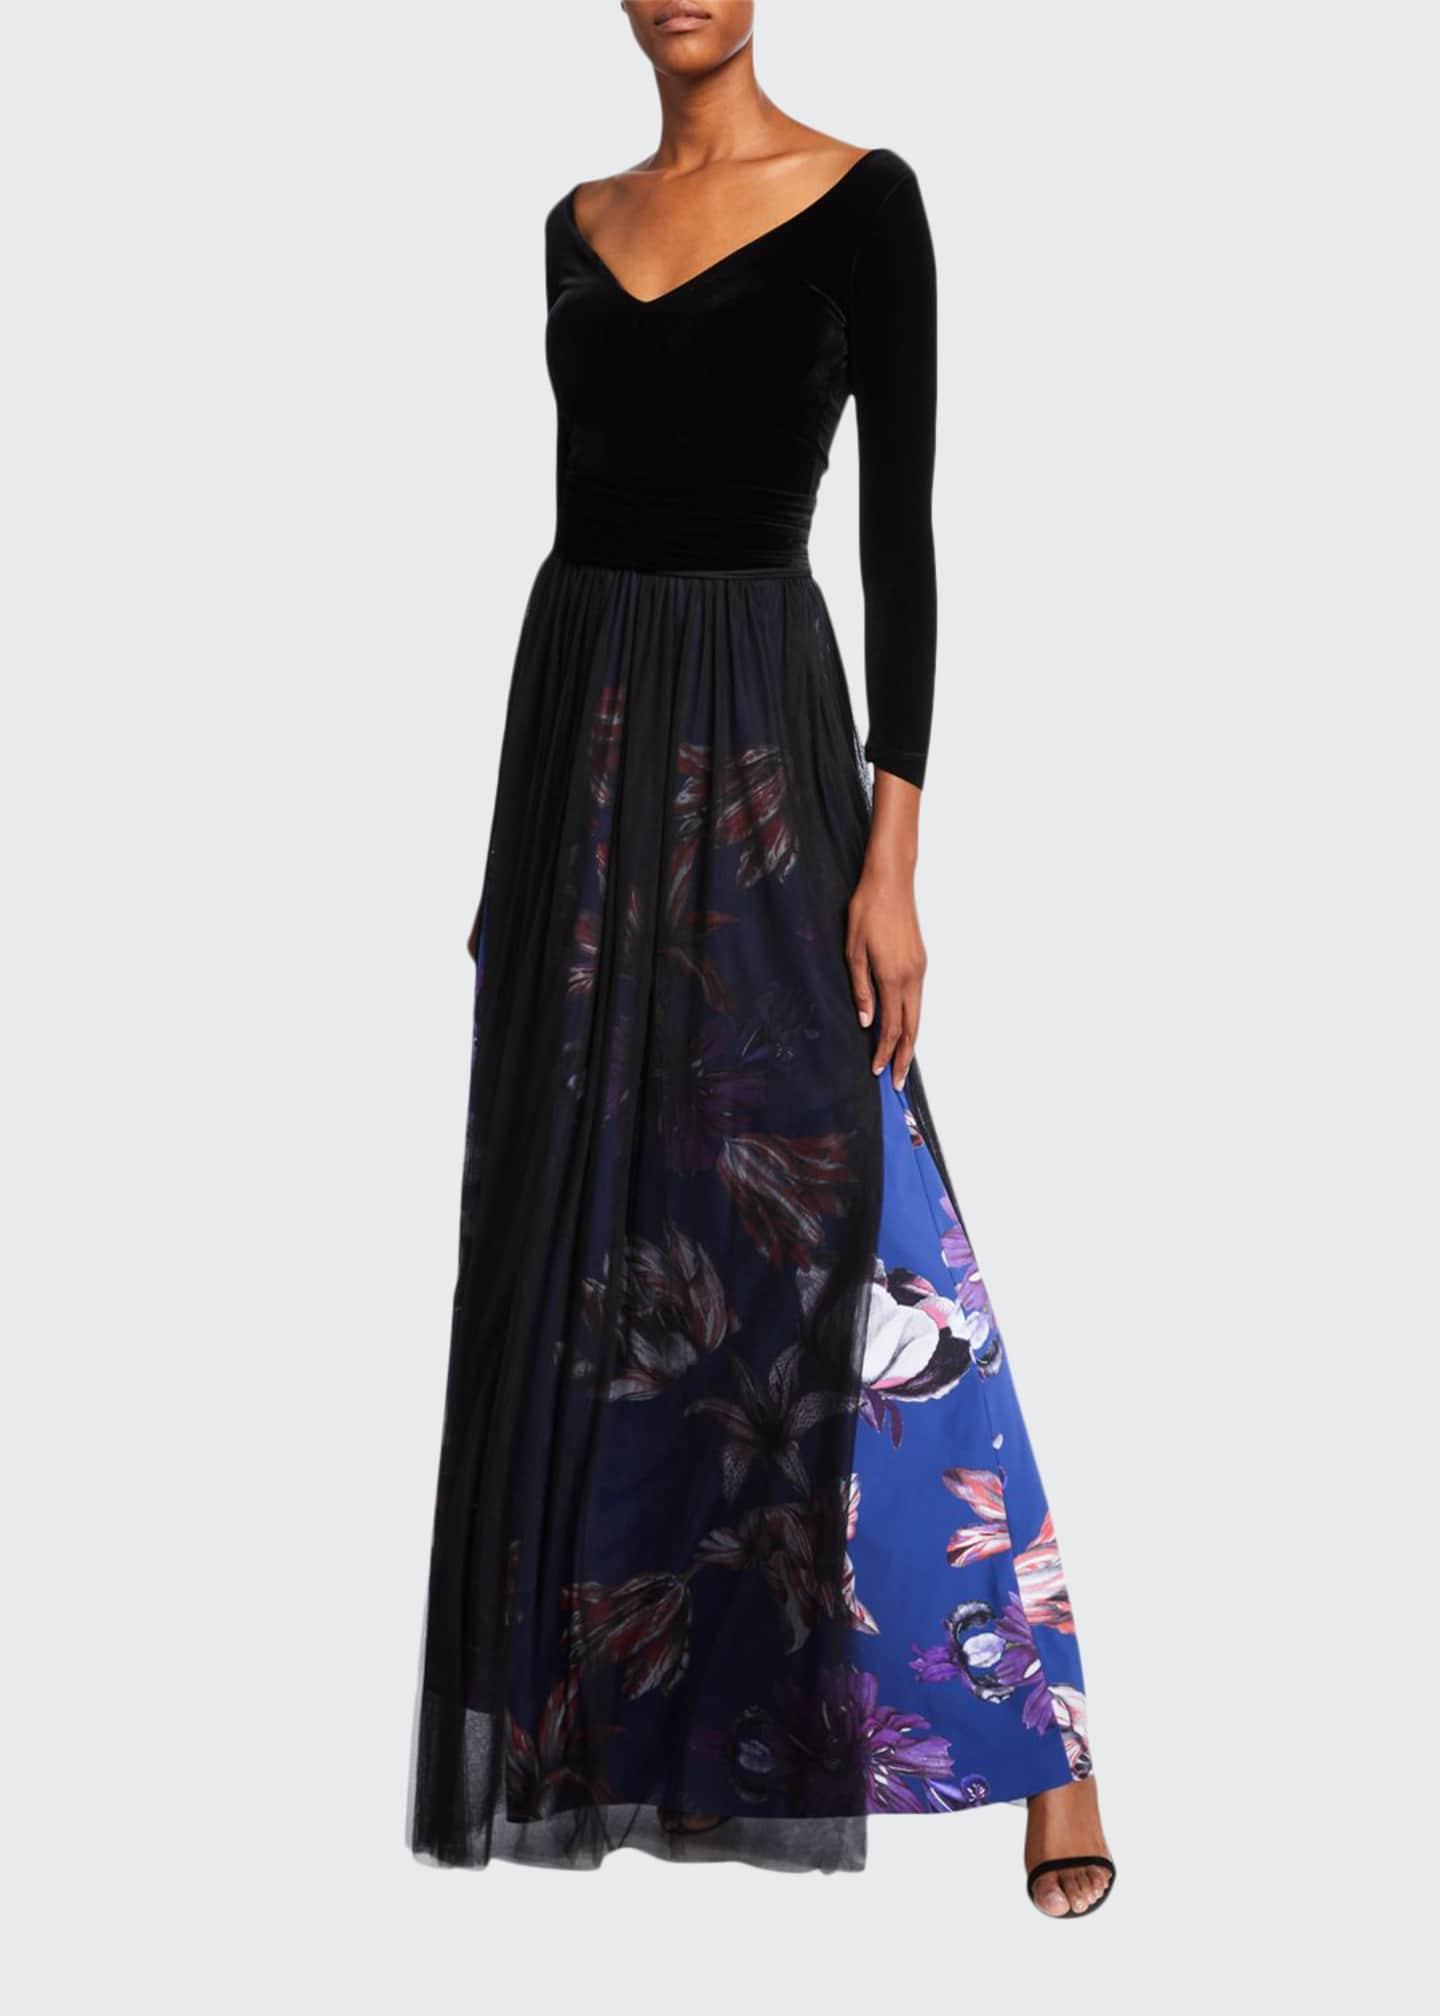 Chiara Boni La Petite Robe V-Neck Long-Sleeve Velvet